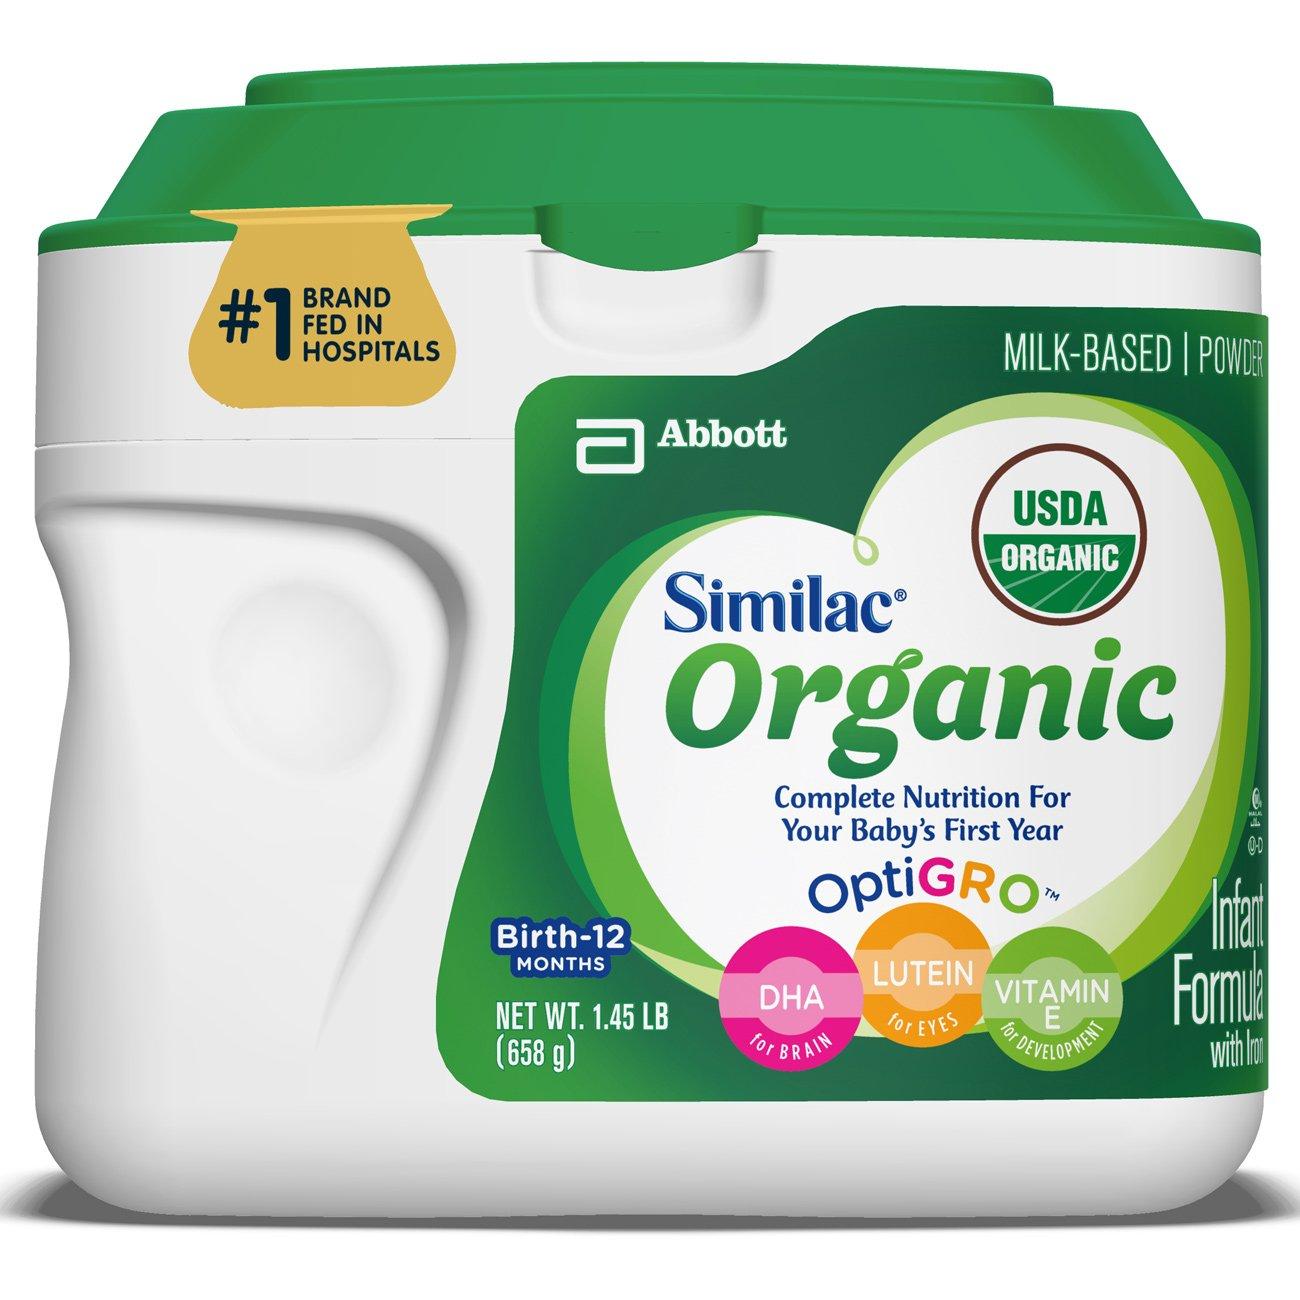 Similac Organic Infant Formula with Iron, USDA Certified Organic, Baby Formula, Powder, 1.45 lb (Pack of 6) by Similac